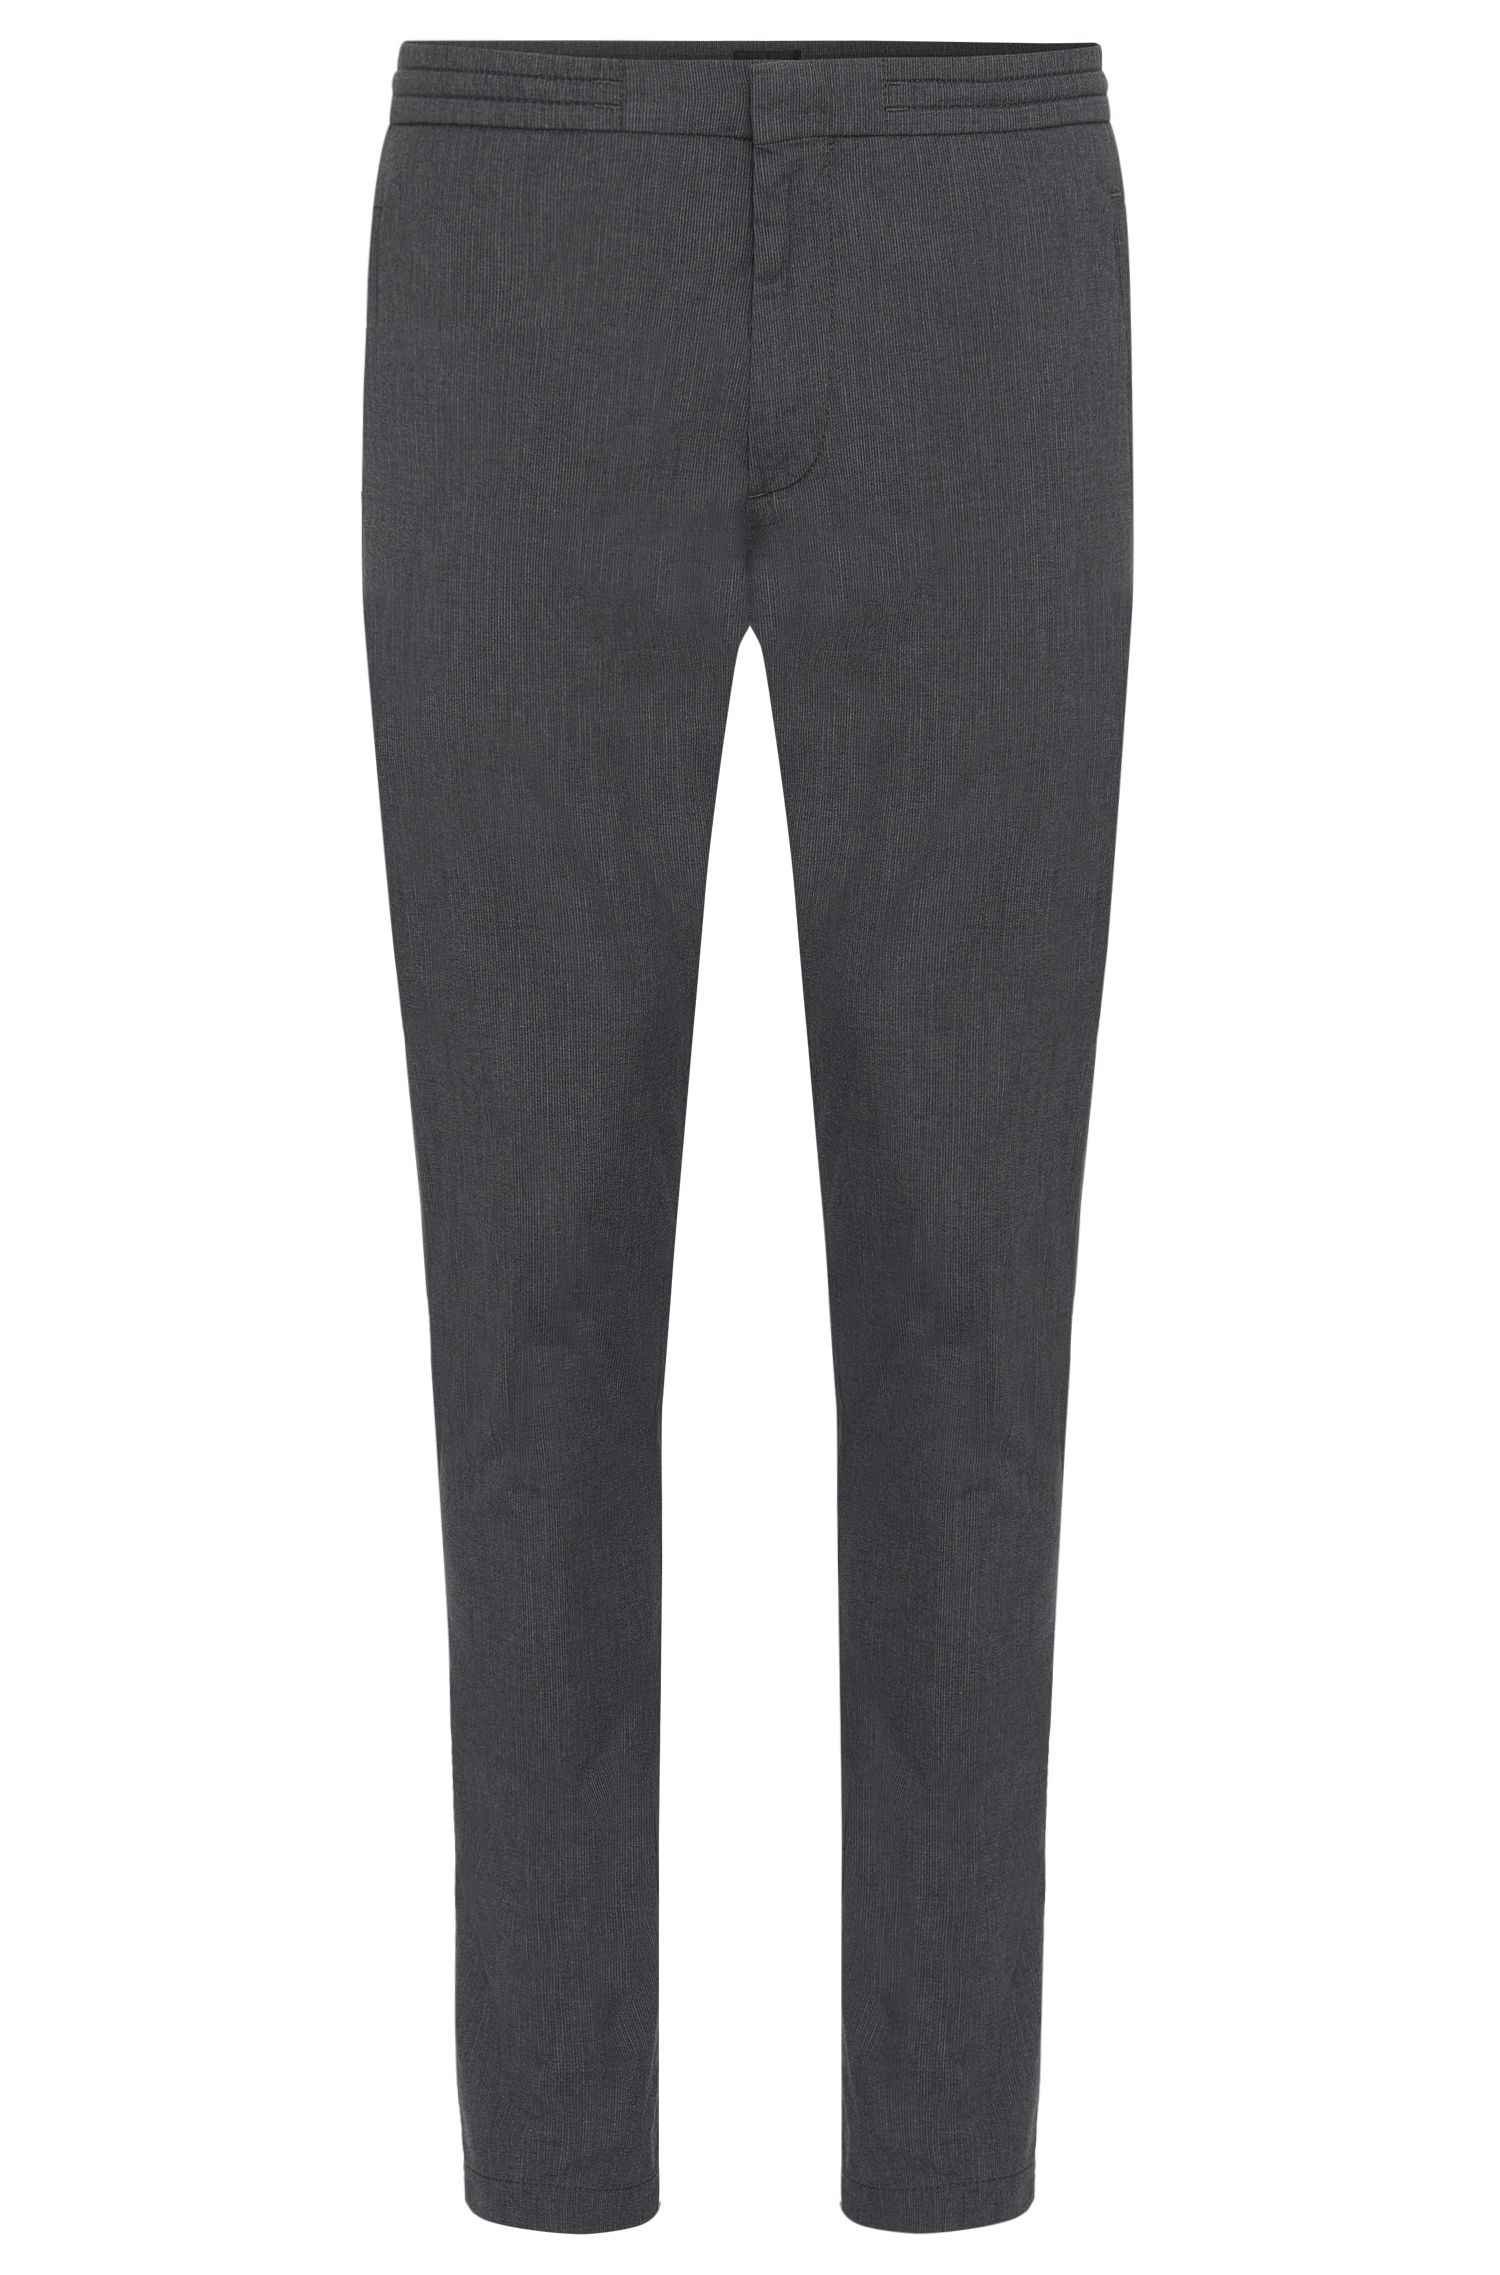 Stretch Cotton Blend Drawstring Pants, Extra Slim Fit | Kito Drawstring W, Grey